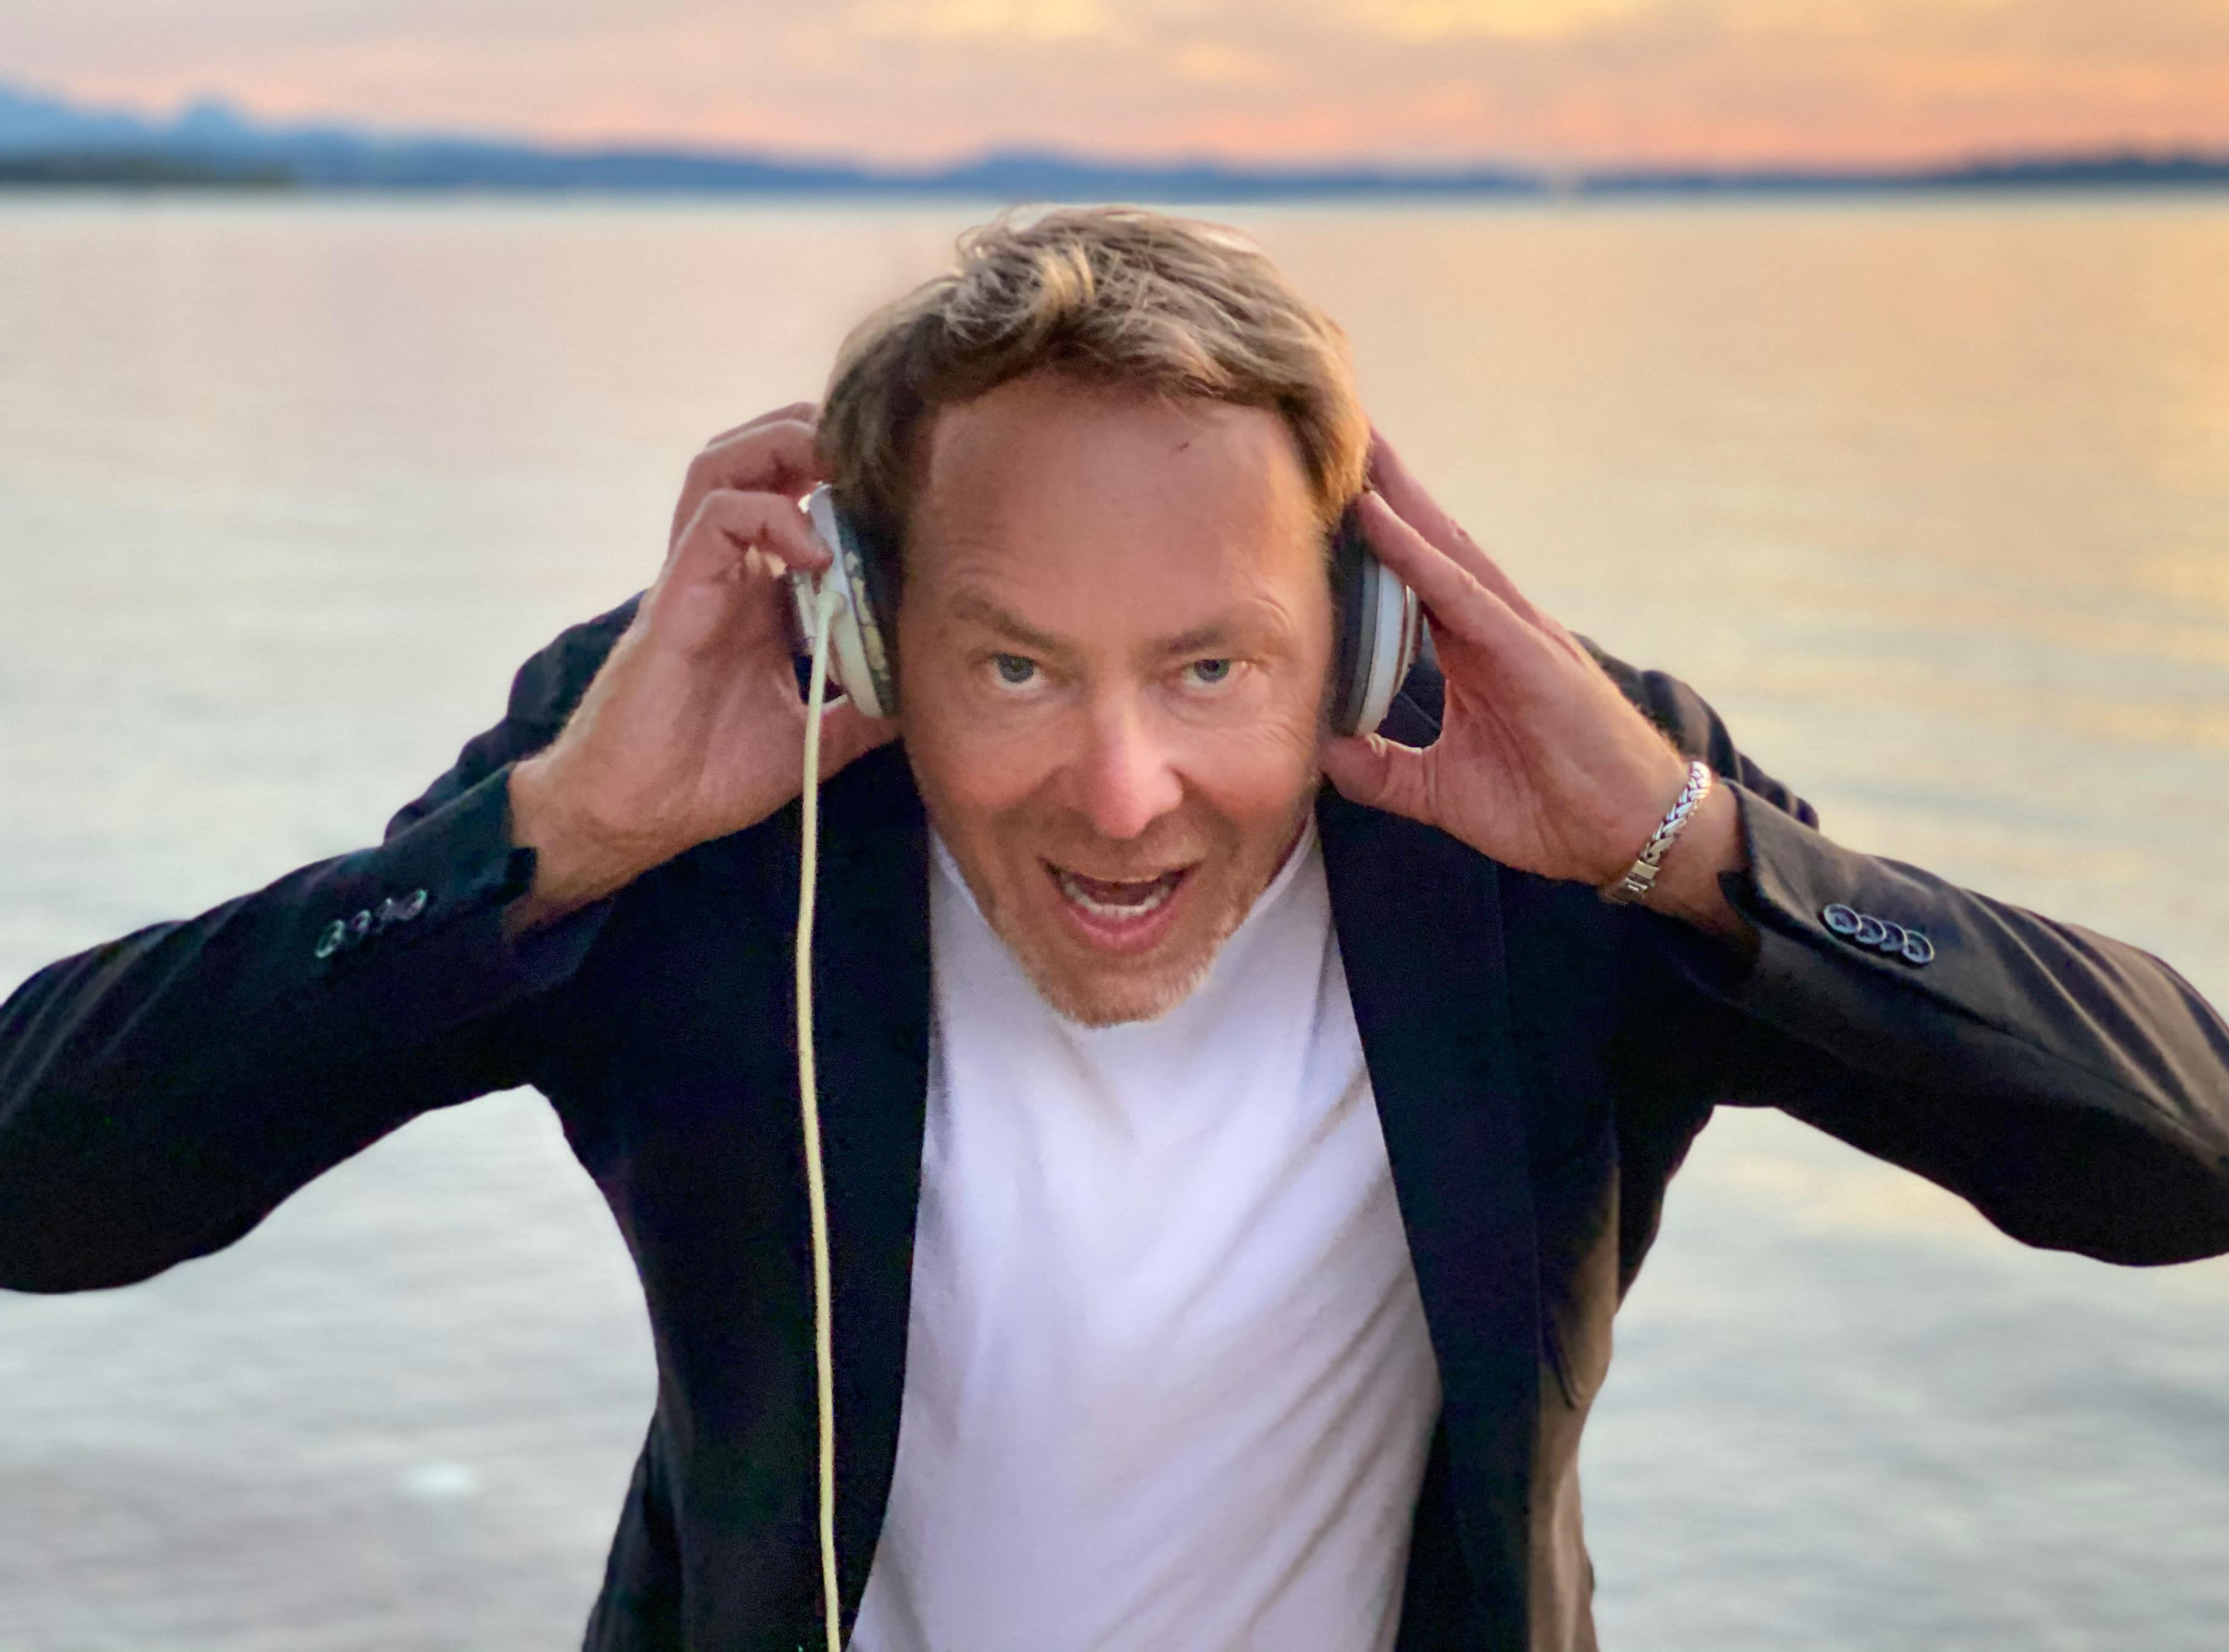 DJ Mike Lindström mit Kopfhörern